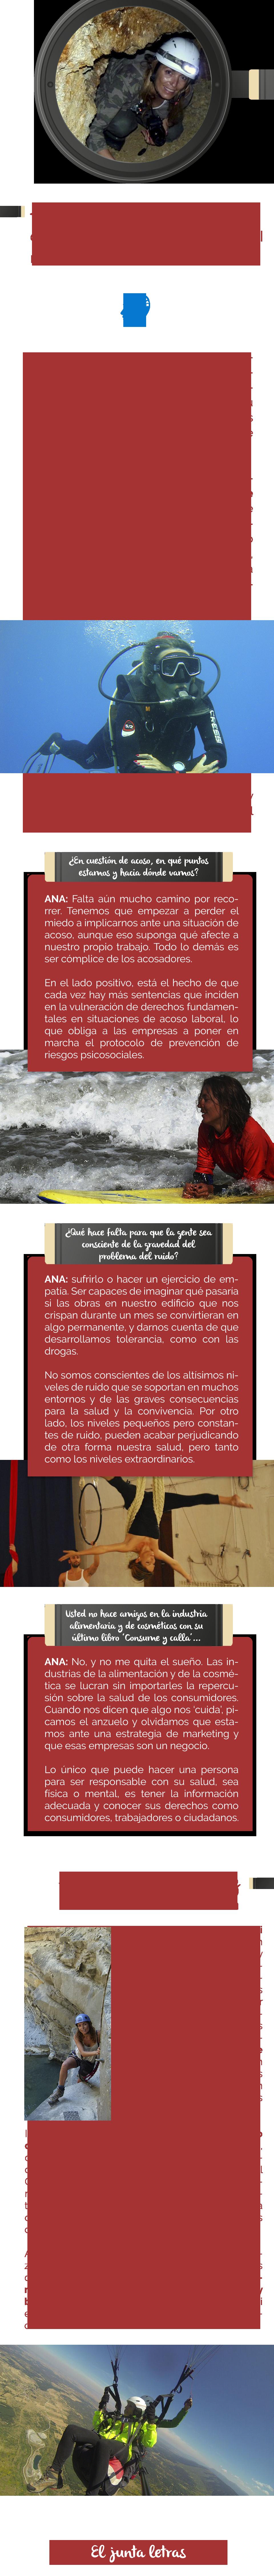 Nanoentrevista Ana I. Gutiérrez Salegui